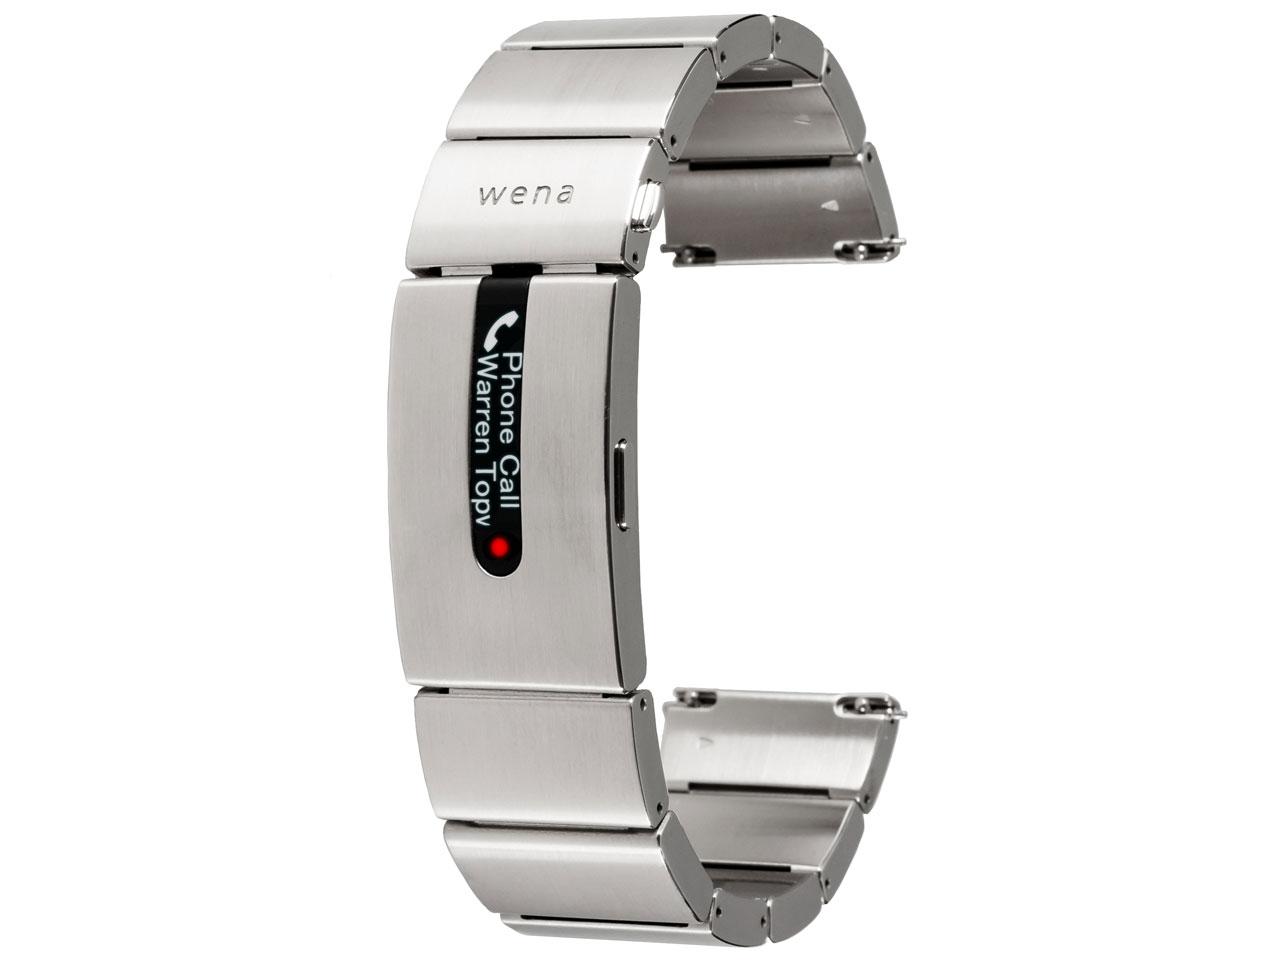 wena wrist pro WB-11A/S [シルバー] の製品画像